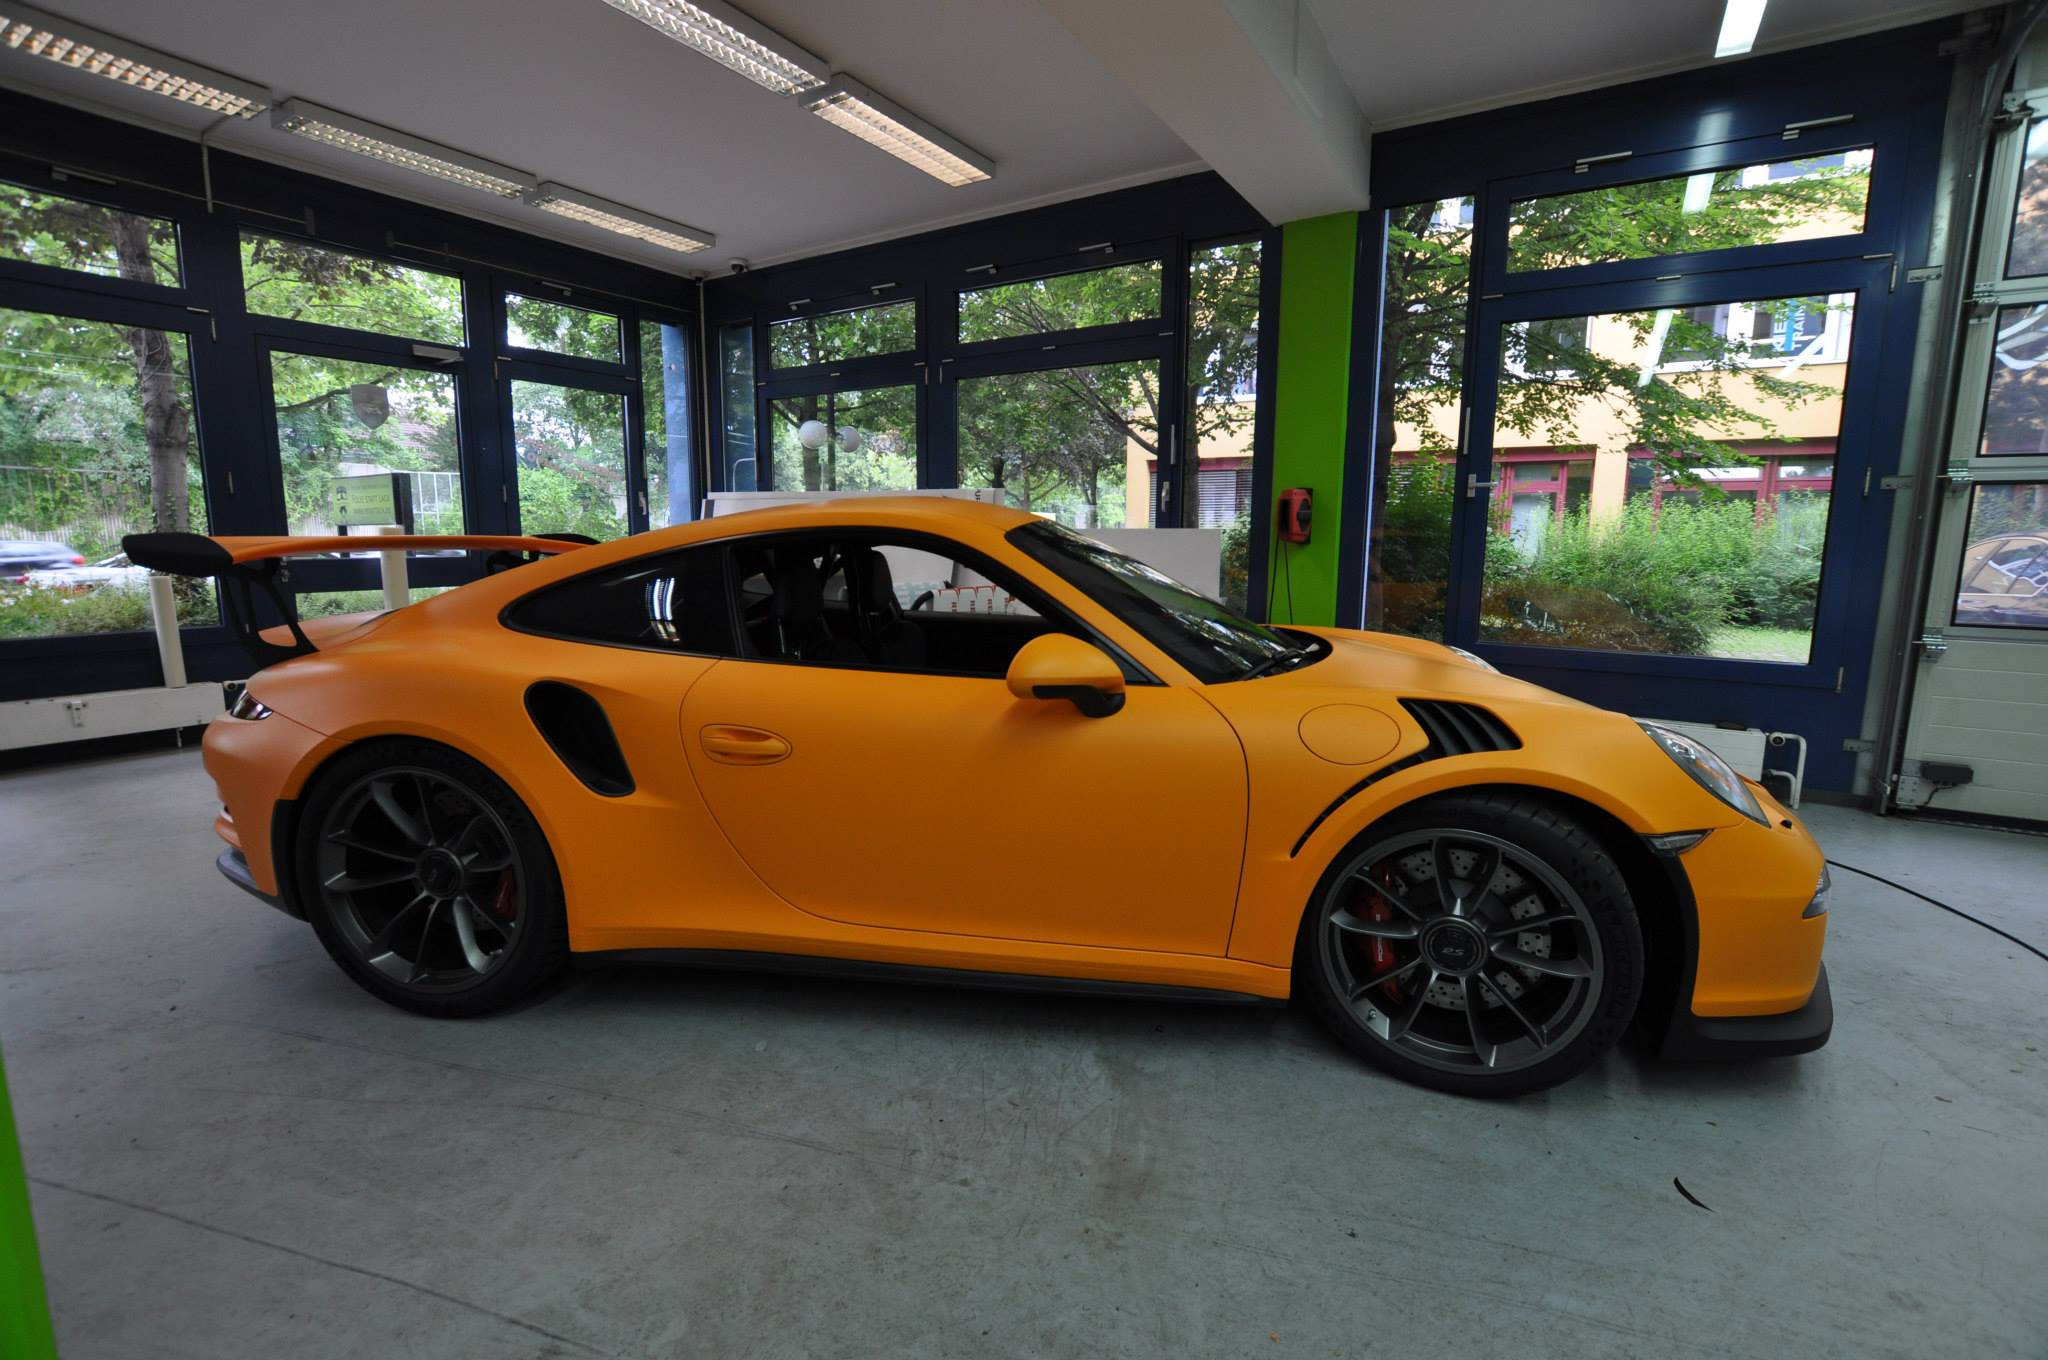 Foto de Porsche 911 GT3 RS naranja mate (6/12)